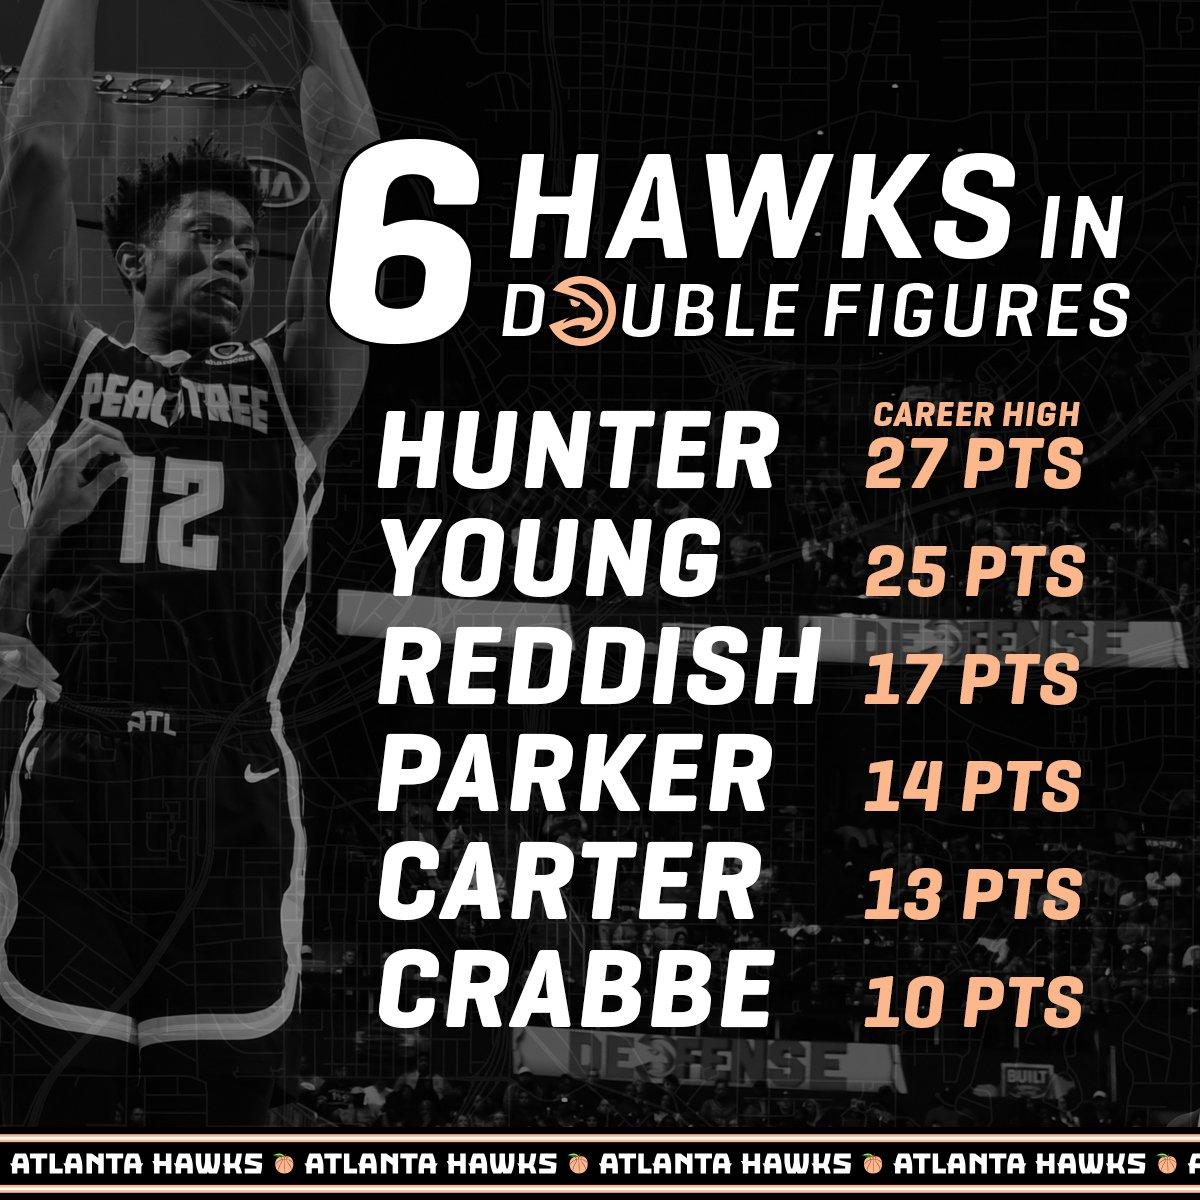 Played hard tonight. We had 6 guys in double figures, including a career night from @drehunter_ 💪  #TrueToAtlanta x #PeachUpATownDown